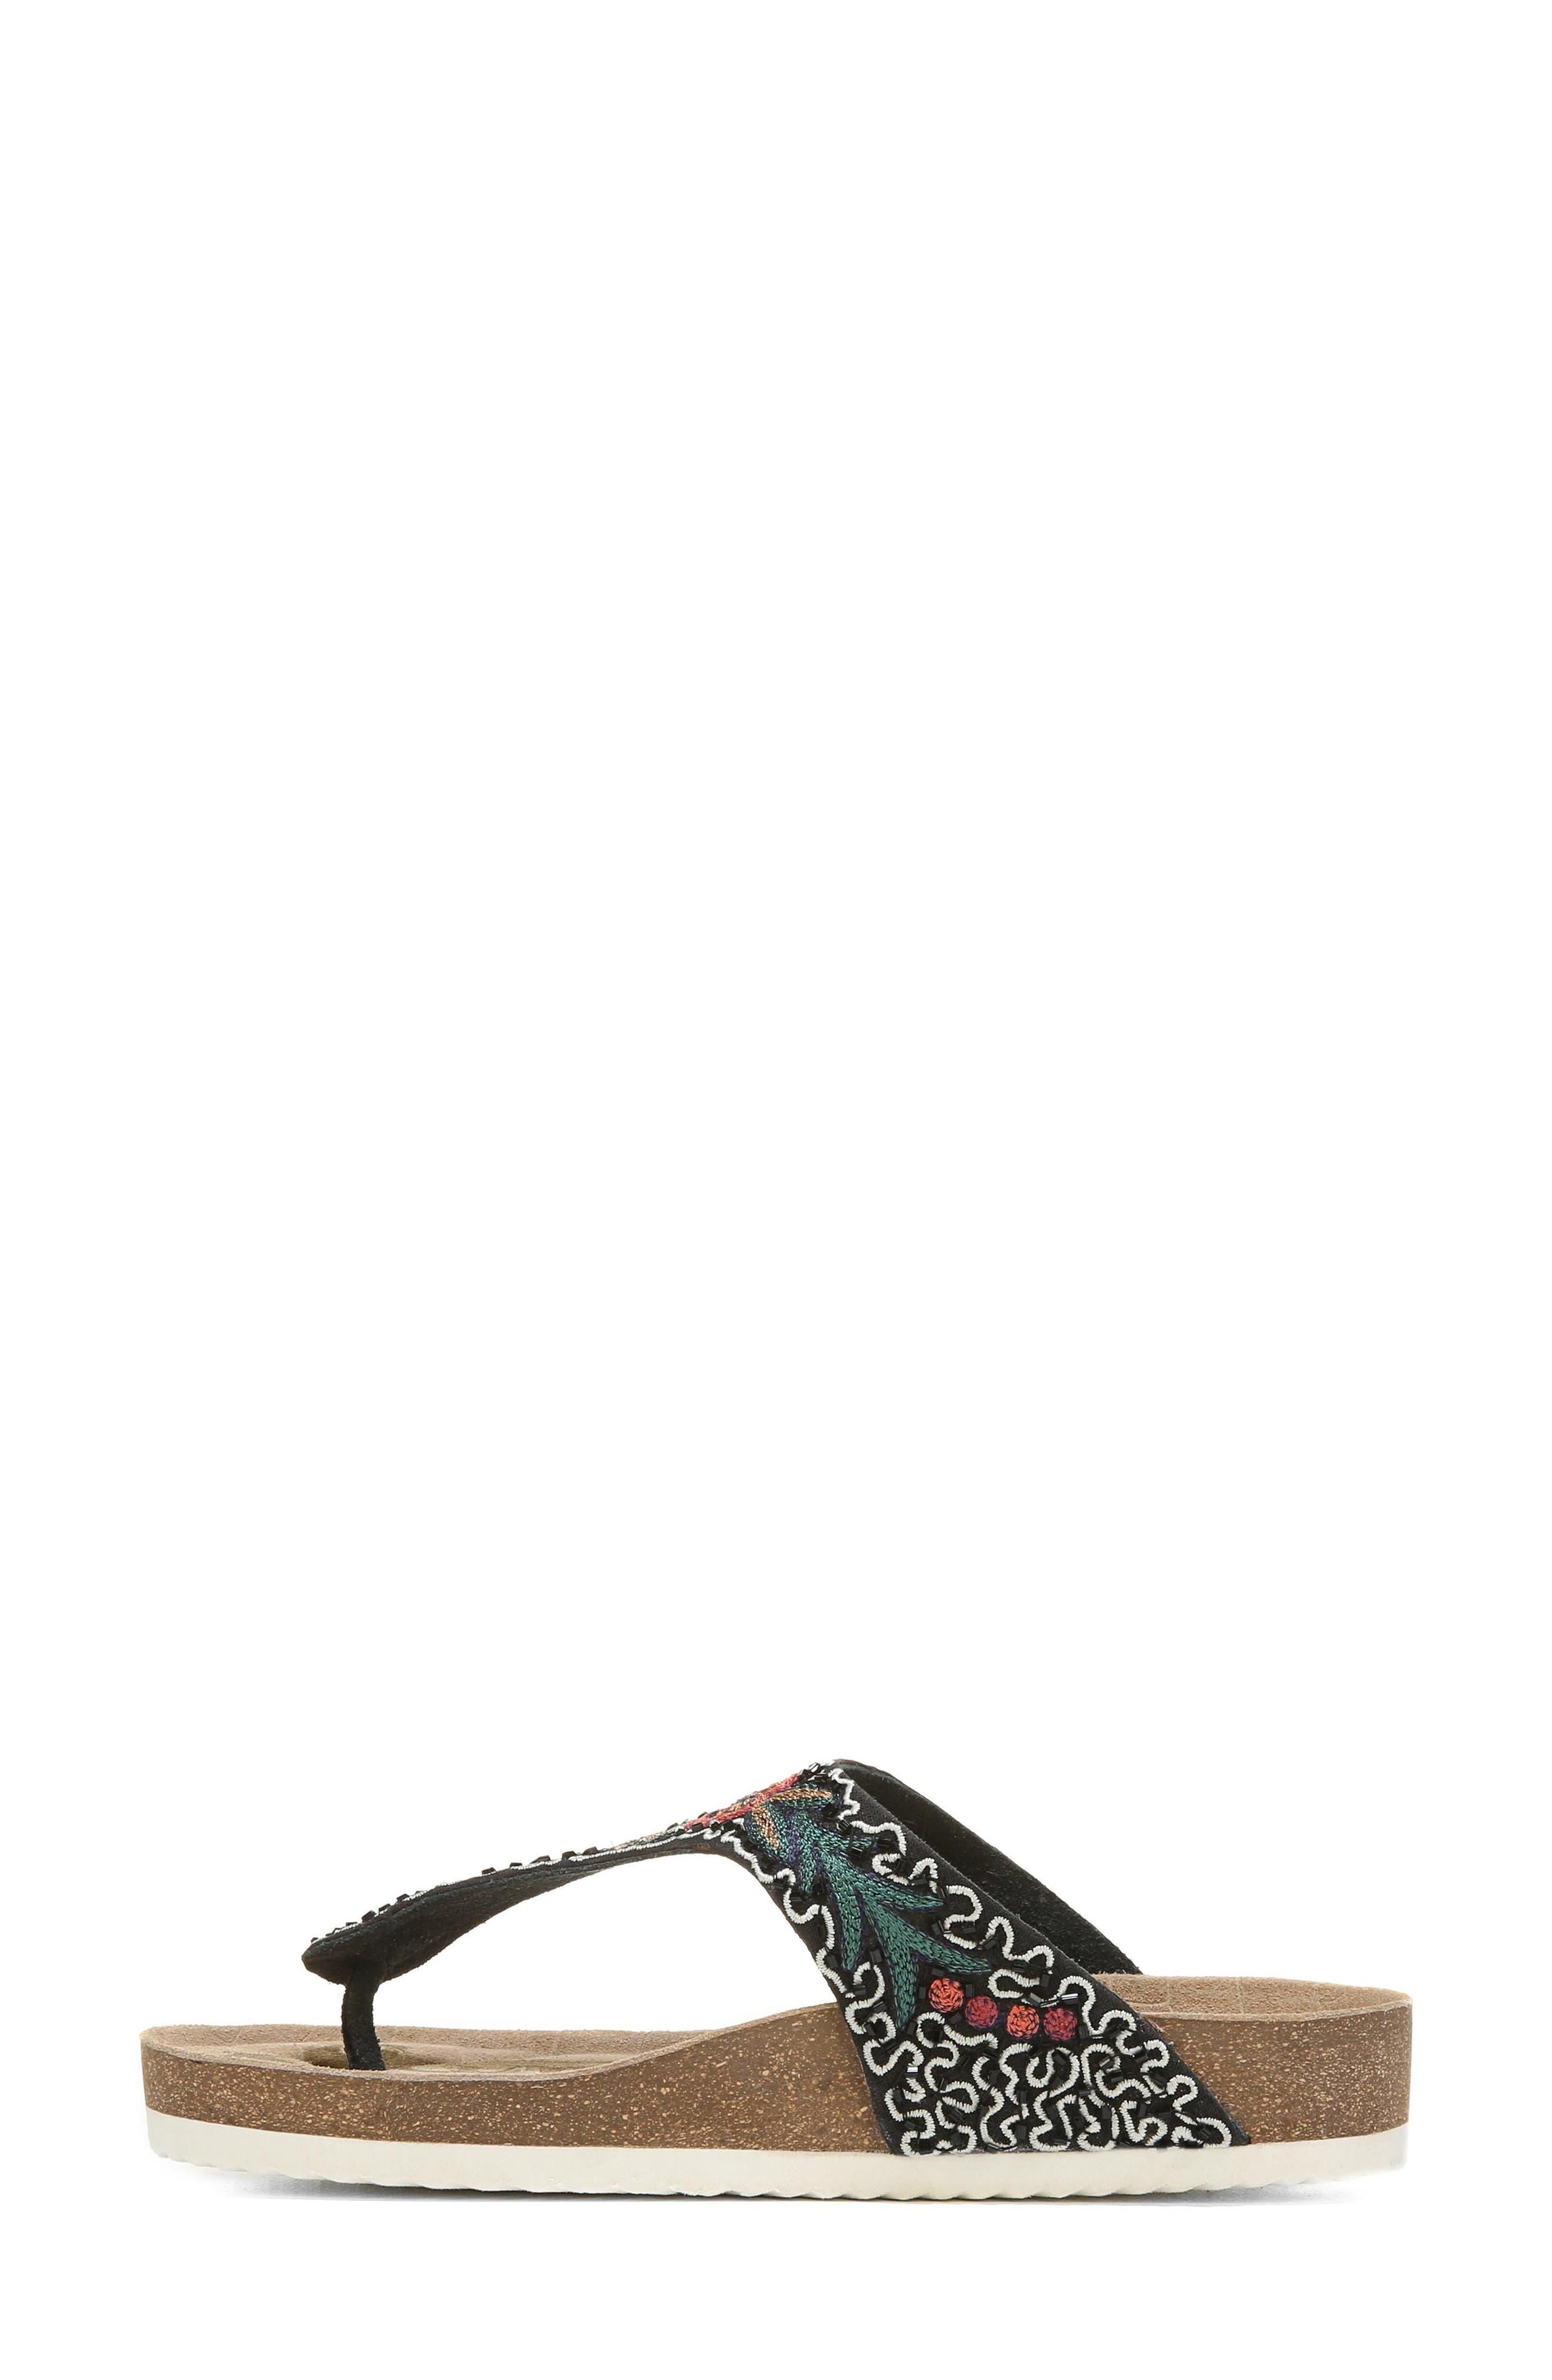 Olivie Beaded Flip Flop,                             Alternate thumbnail 3, color,                             Black Multi